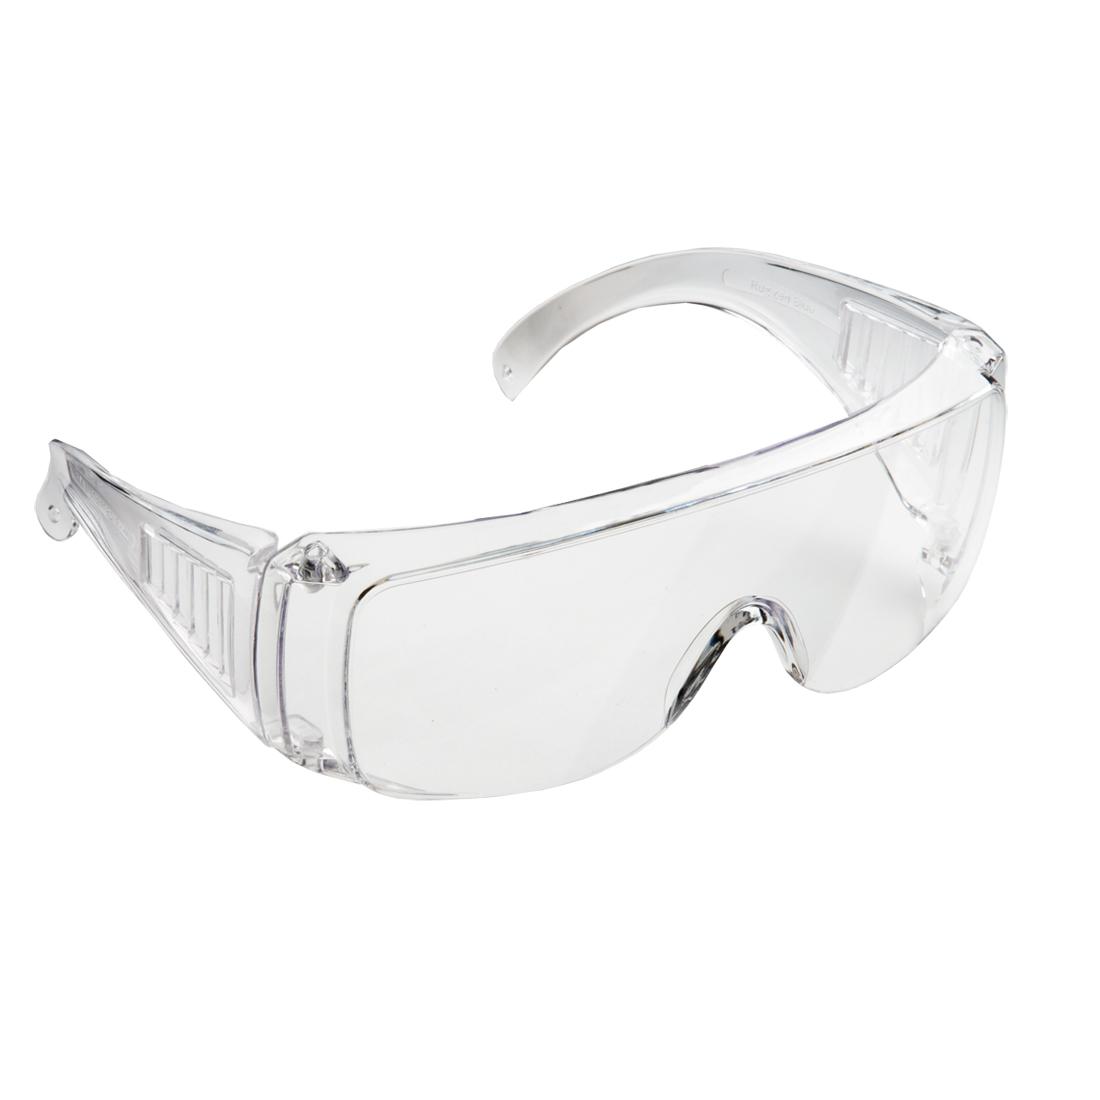 Safety Glasses image